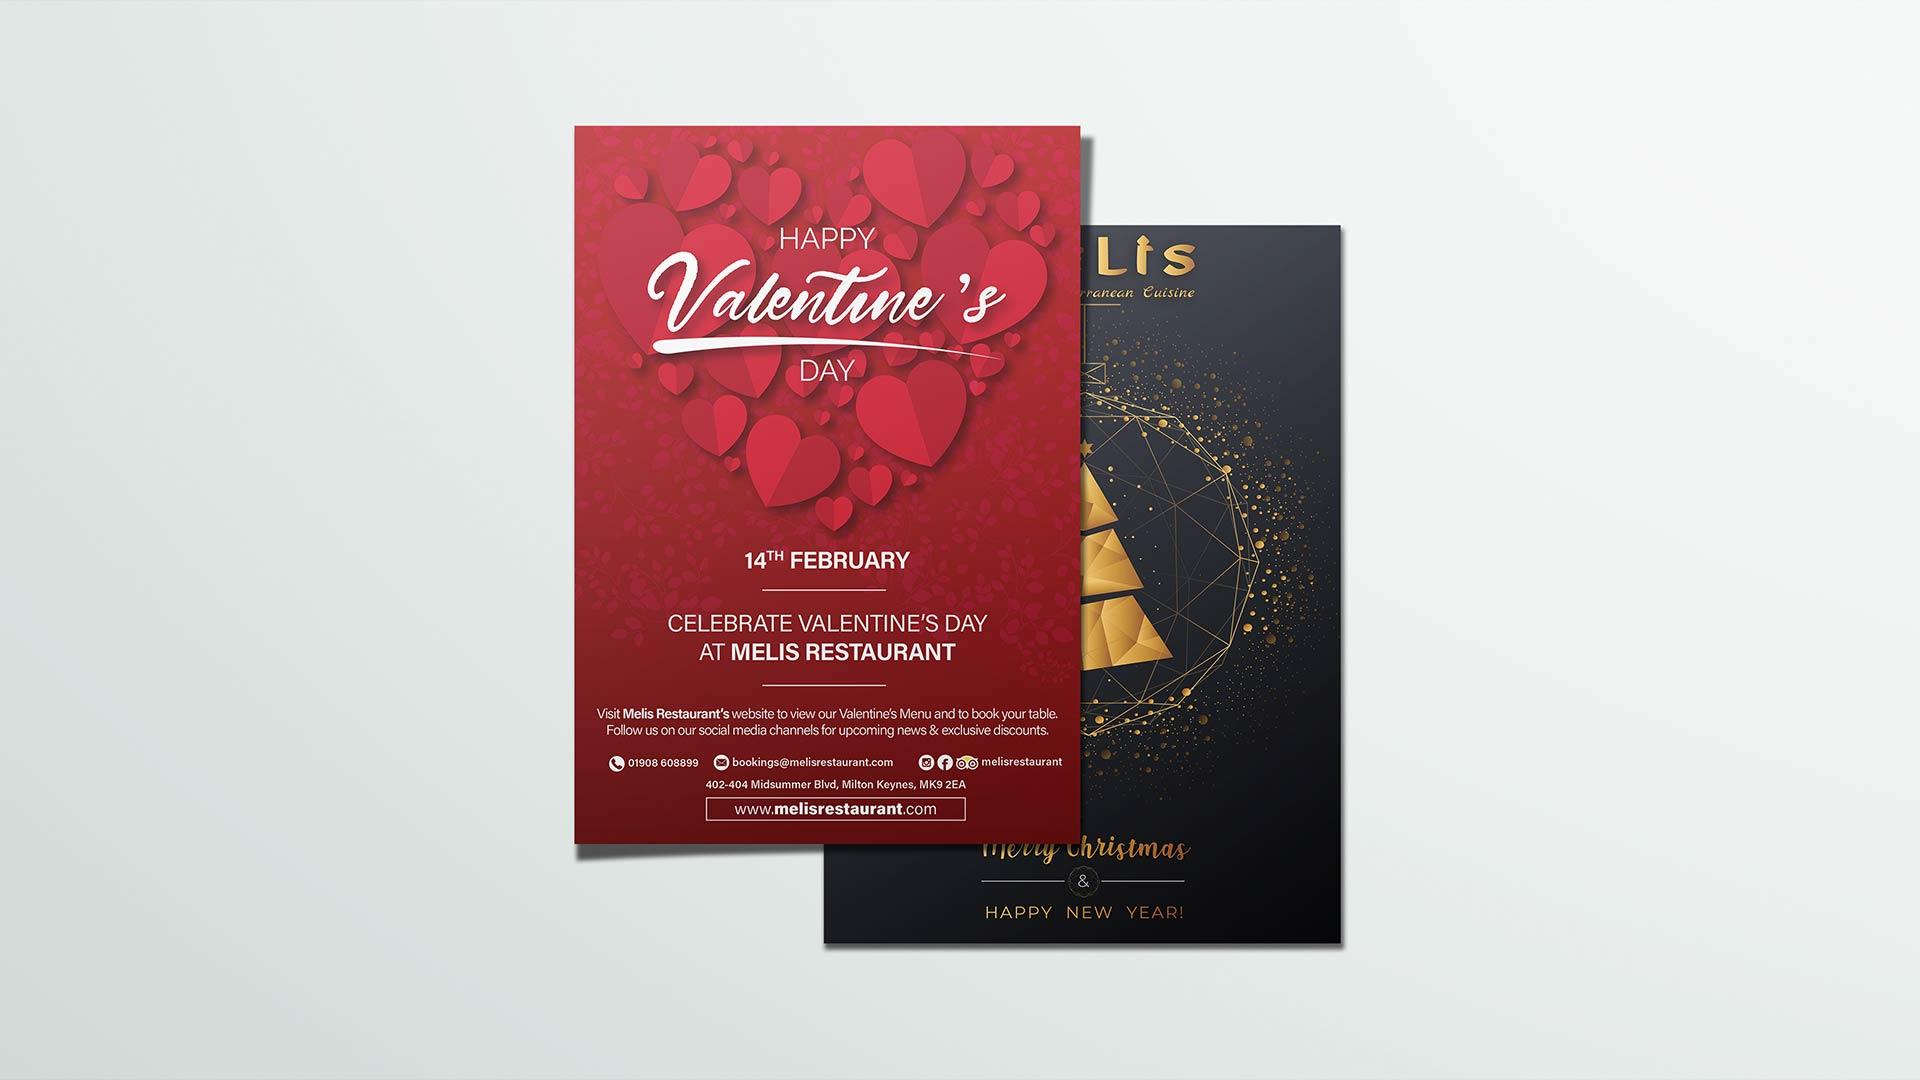 valentines day poster design, christmas poster design